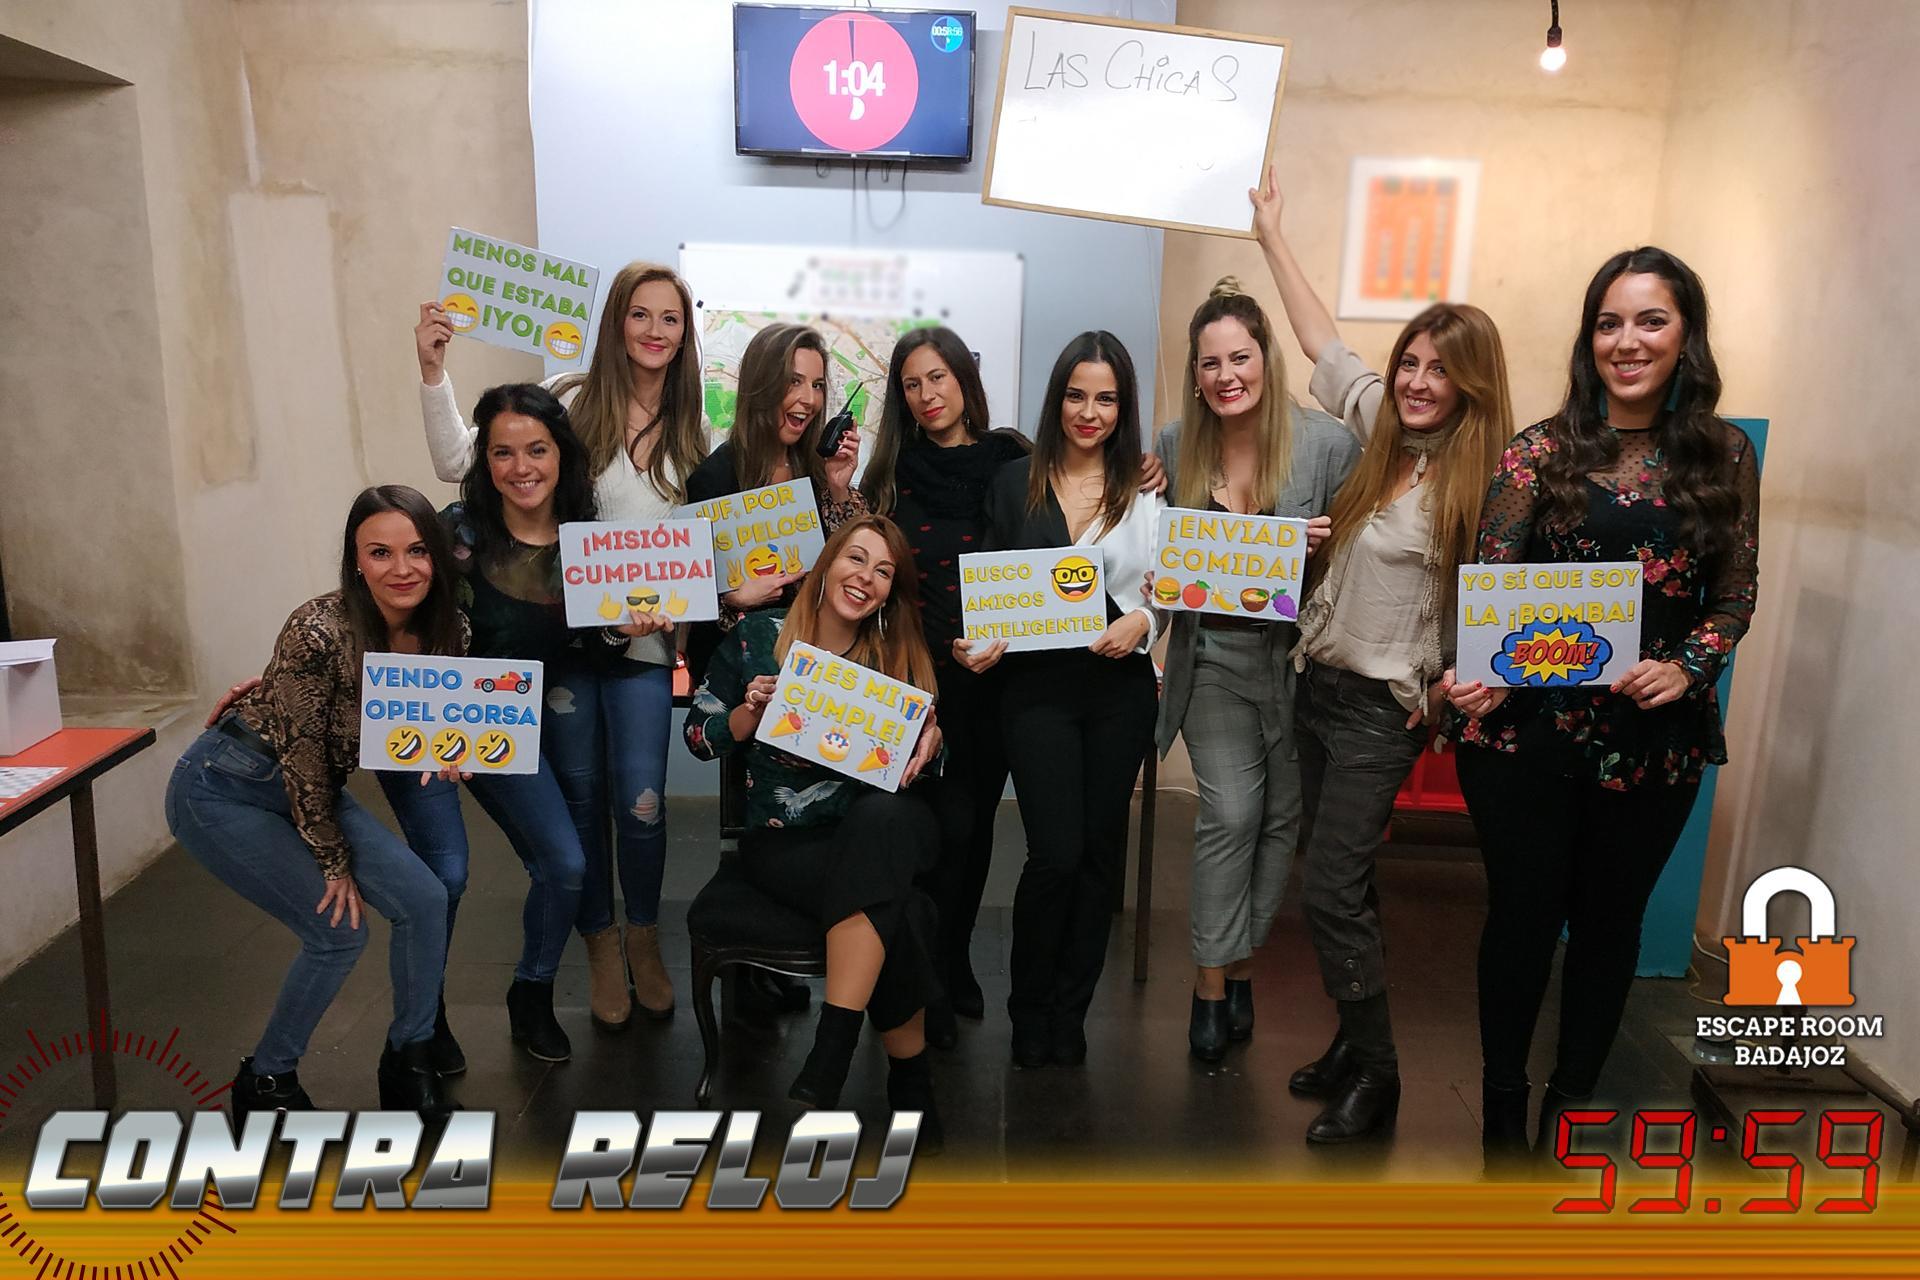 Buscar chicas de Badajoz